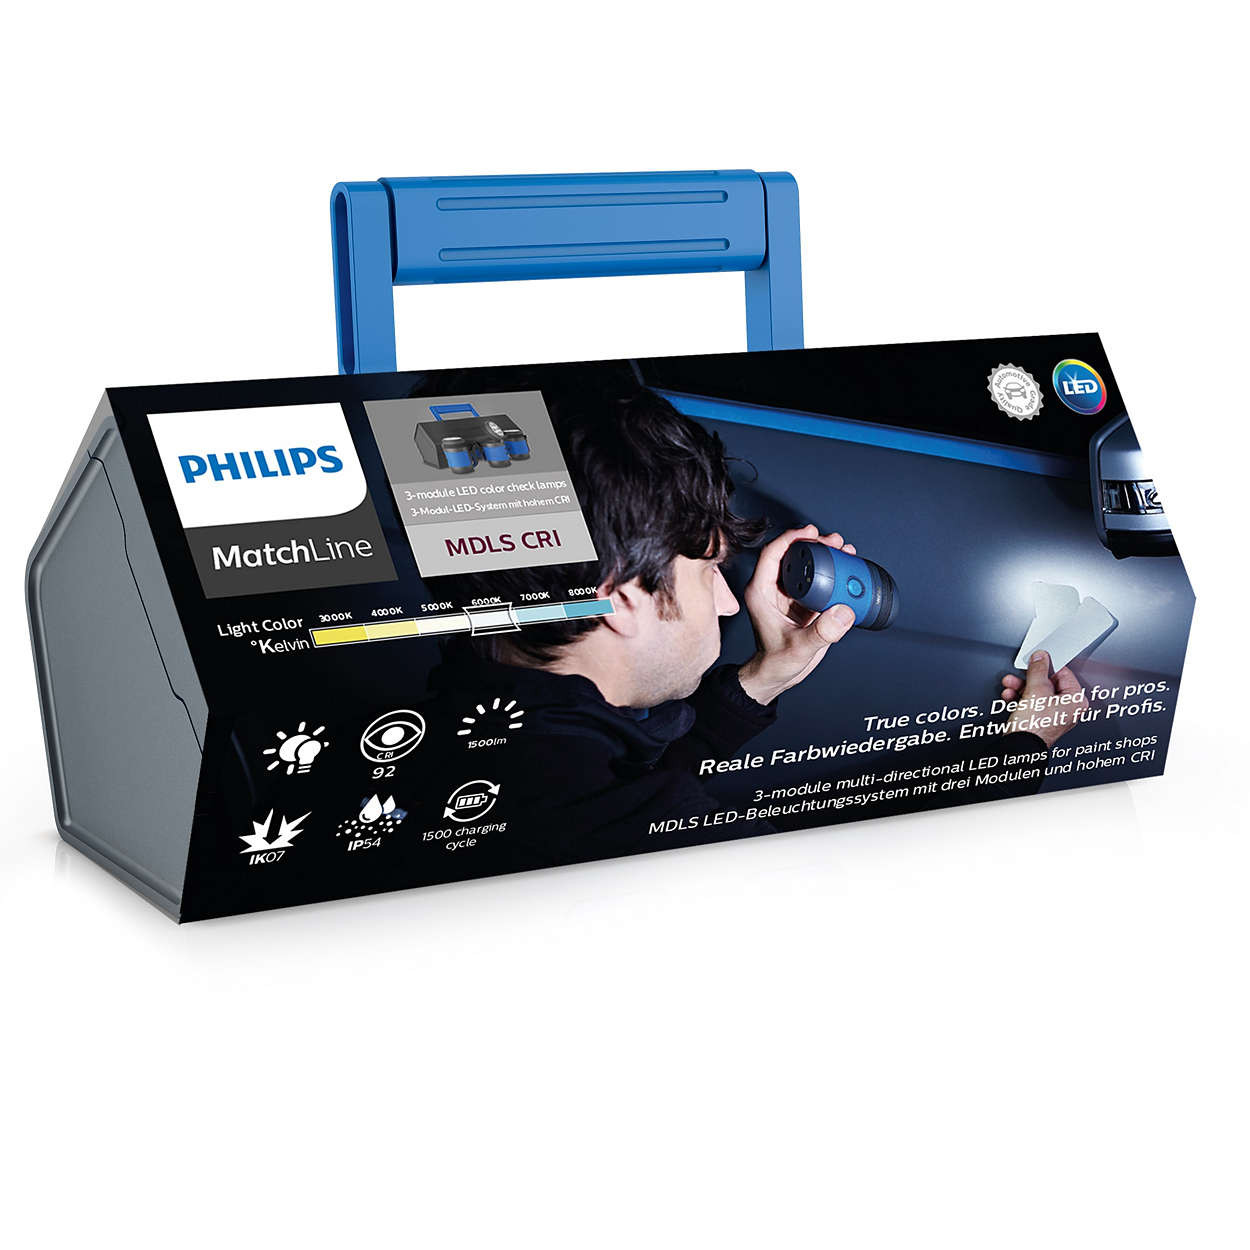 LED-Werkstattlampe-MDLS-hohe-CRI-Multidirektionales-Beleuchtungssystem-Philips